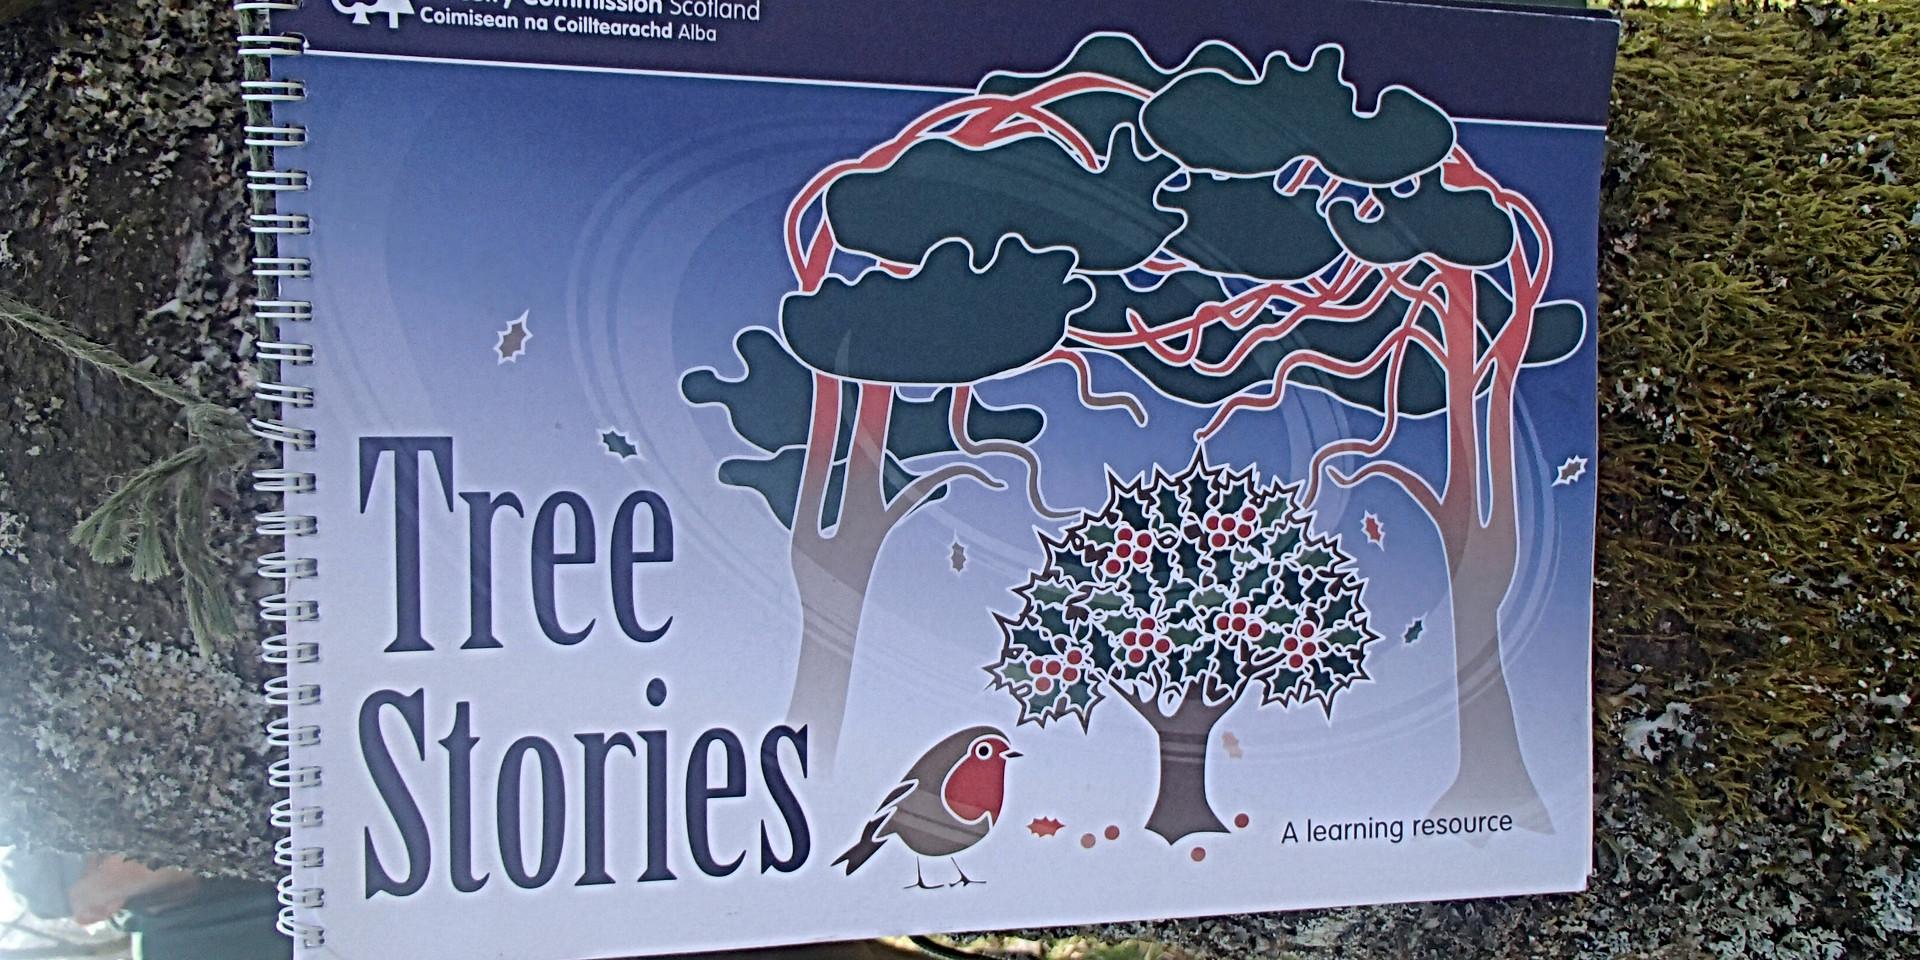 Tree Stories resources